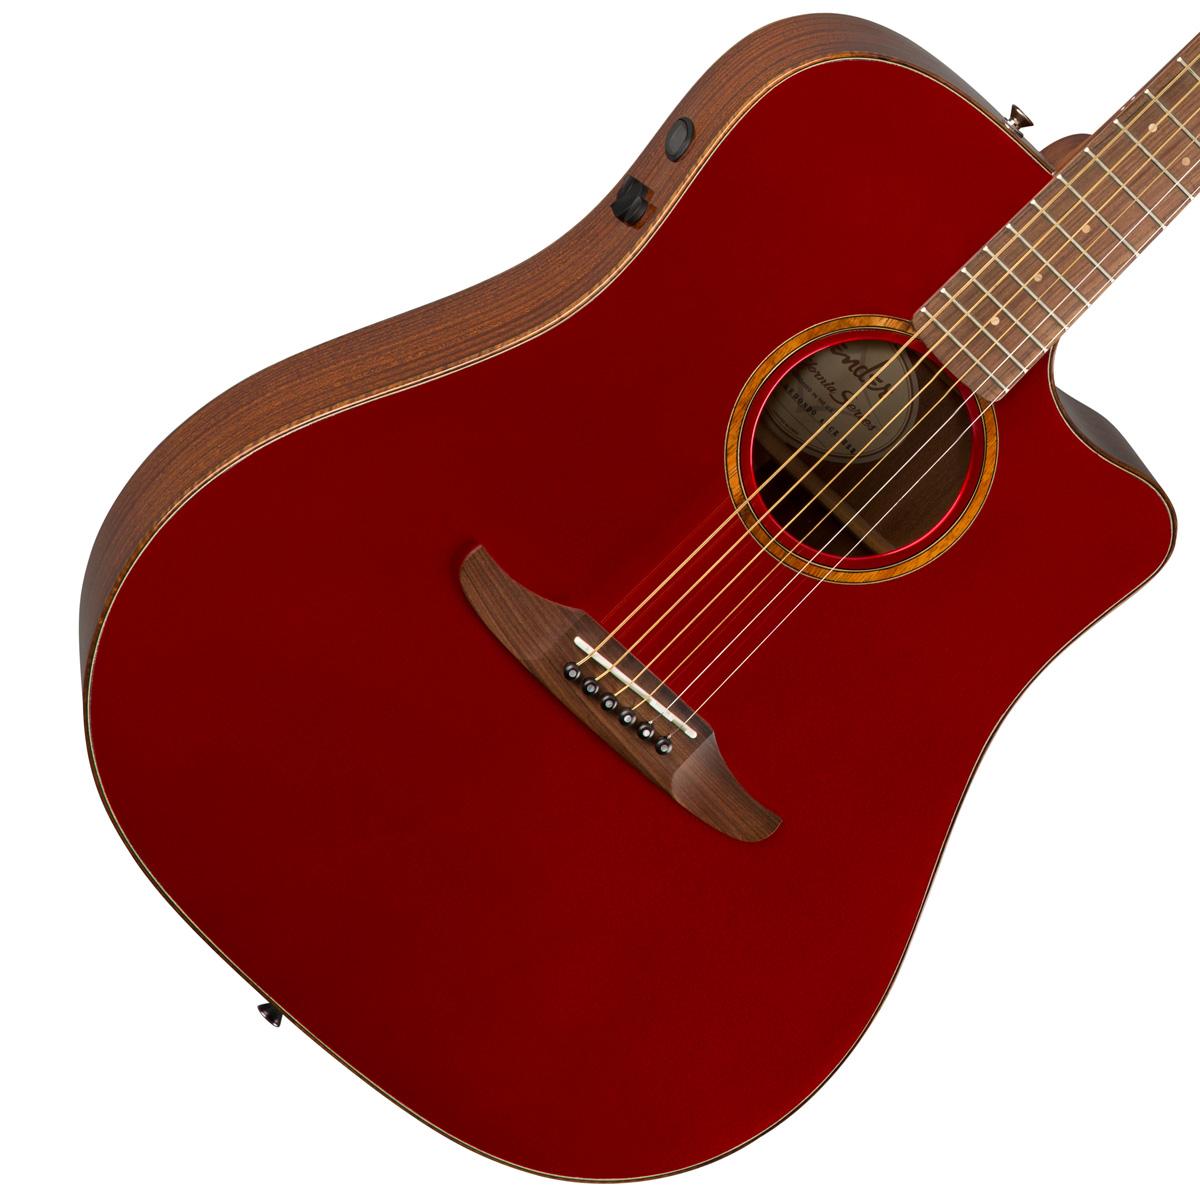 FENDER / REDONDO CLASSICHOT ROD RED METALLIC (HRM) 【CALIFORNIA SERIES】フェンダー アコースティックギター【YRK】